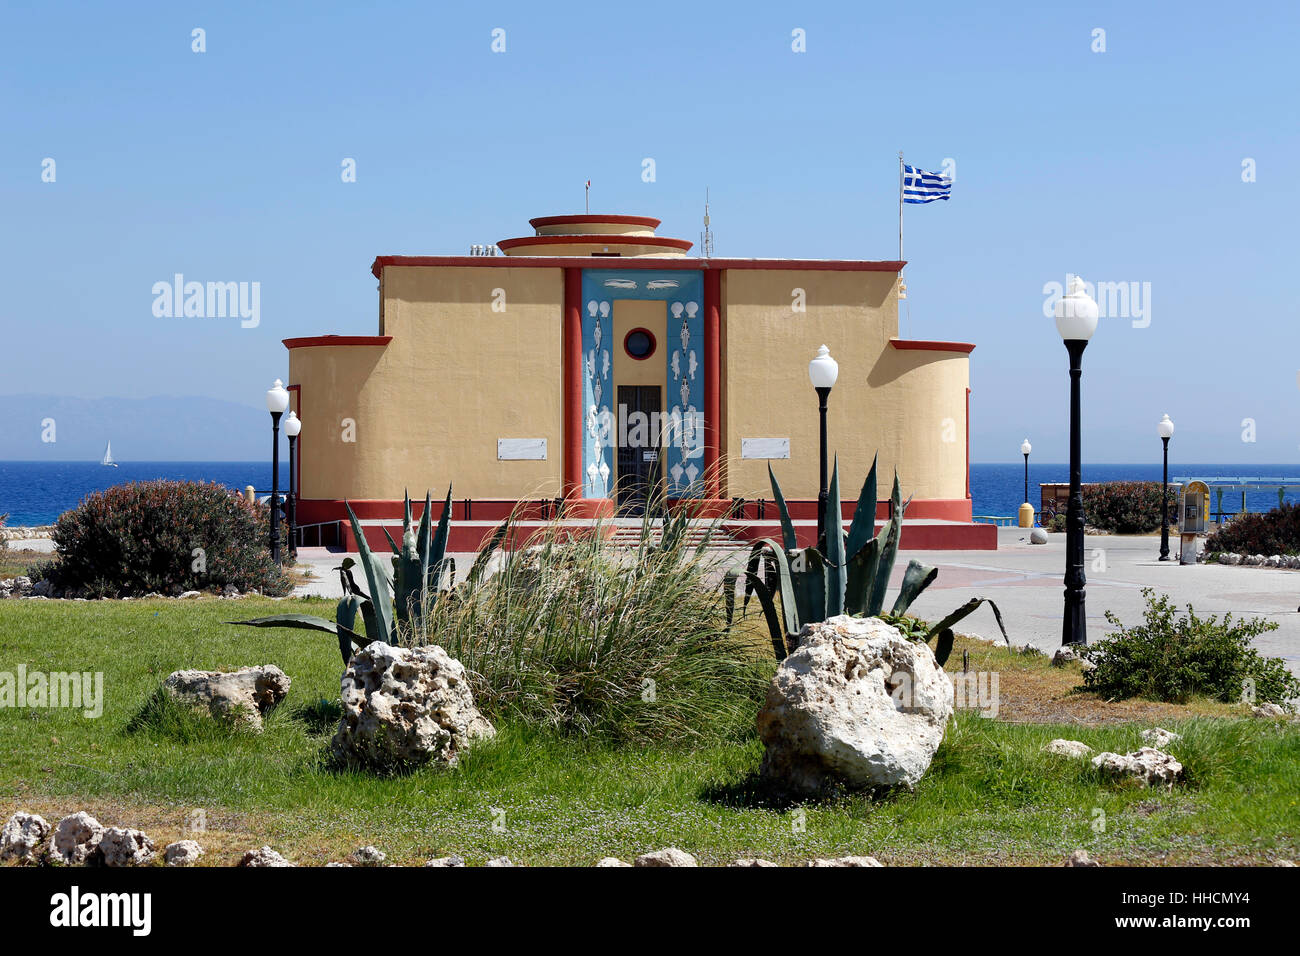 aquarium, greece, europe, water, mediterranean, salt water, sea, ocean, greek, Stock Photo